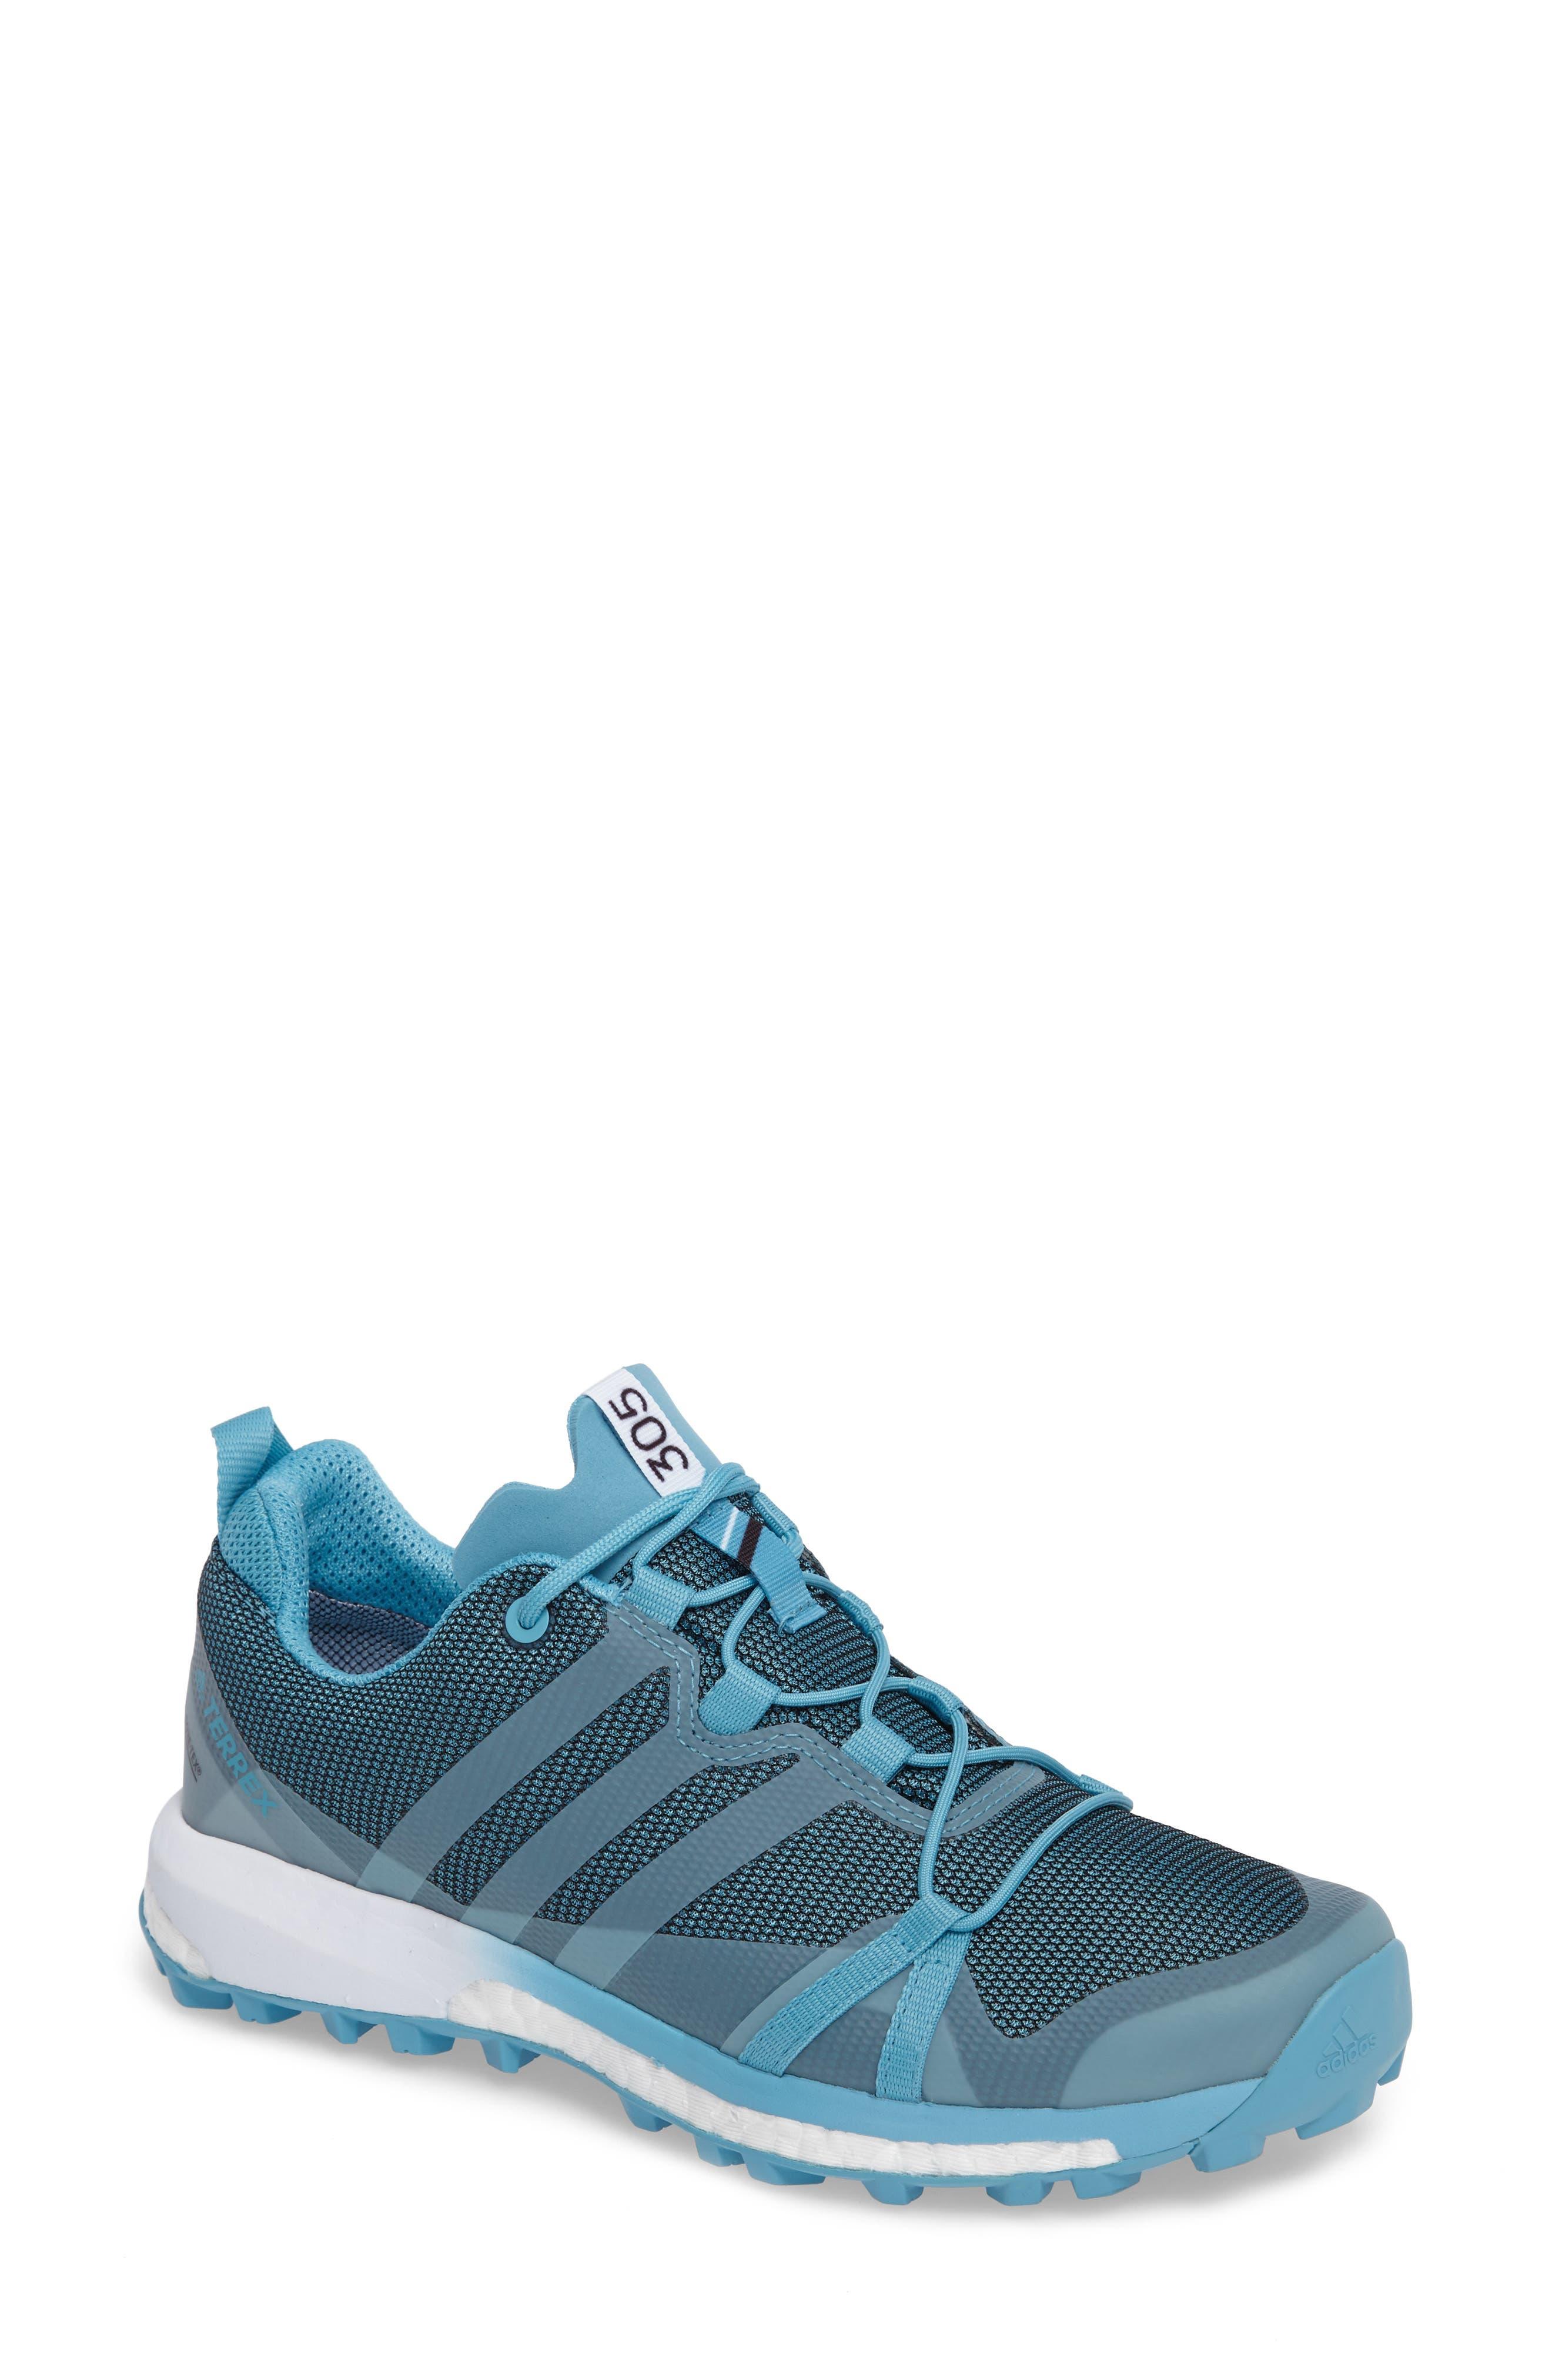 Main Image - adidas 'Terrex Agravic GTX' Trail Shoe (Women)